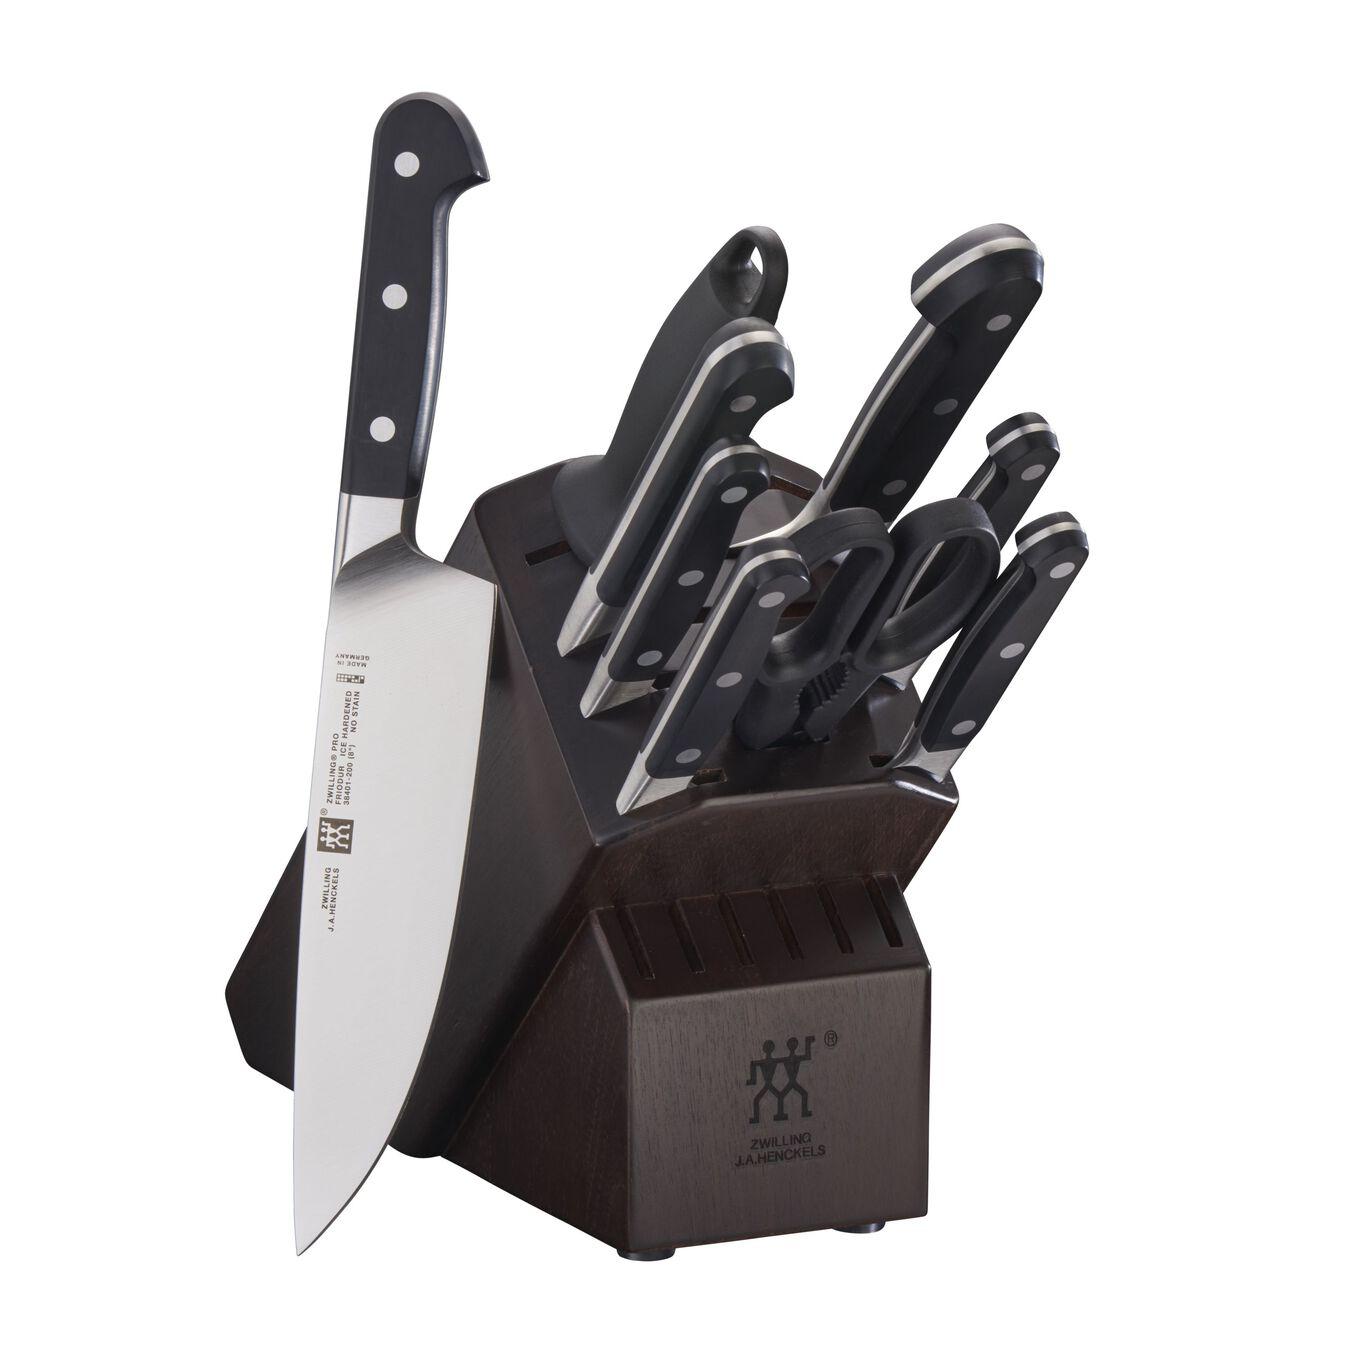 10-pc Knife Block Set - Walnut,,large 1